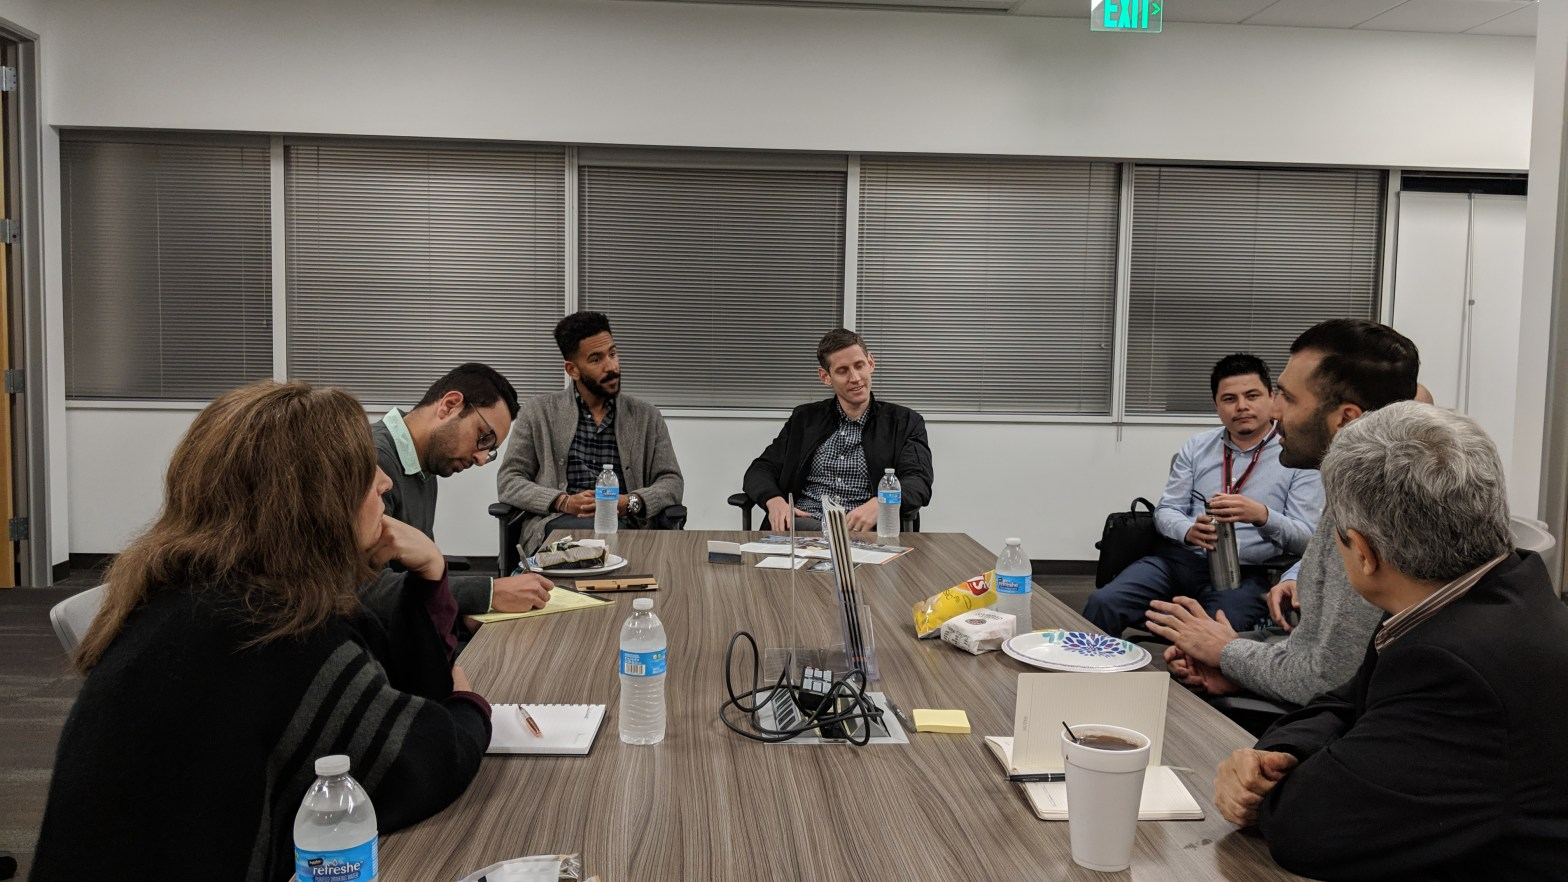 CSUF Startup Sales Talk Group Photo